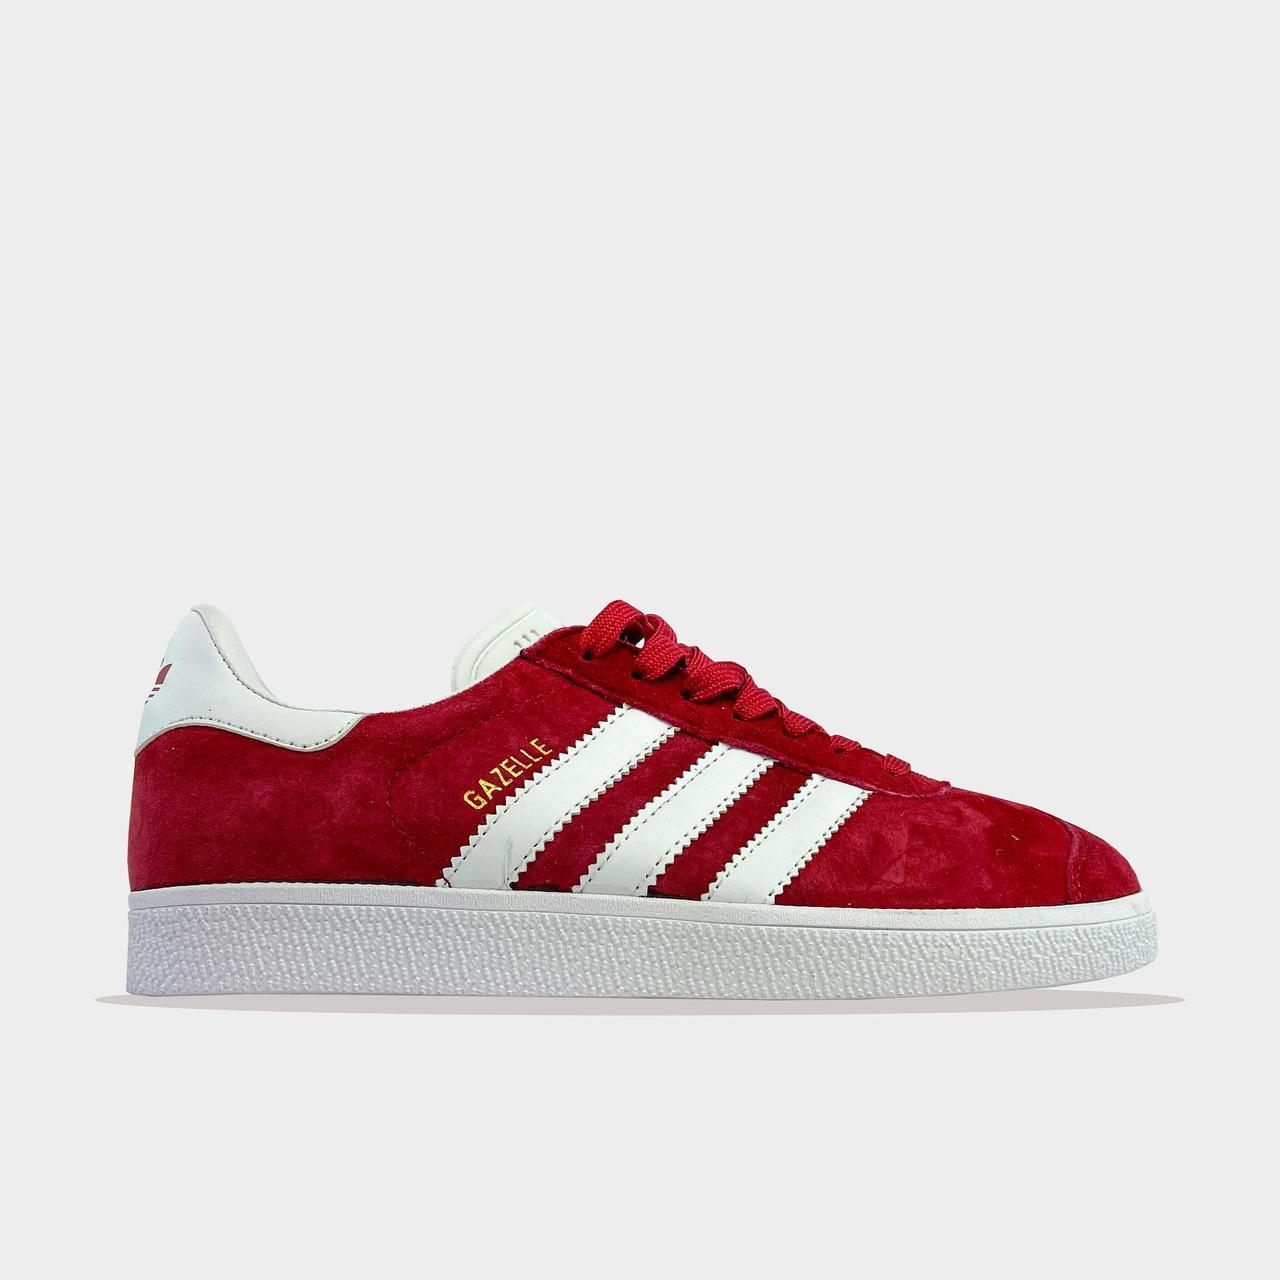 Ad!id@s, крос, обувь, взуття, sneakers, шузы, Gazelle Burgundy (Бордовый)